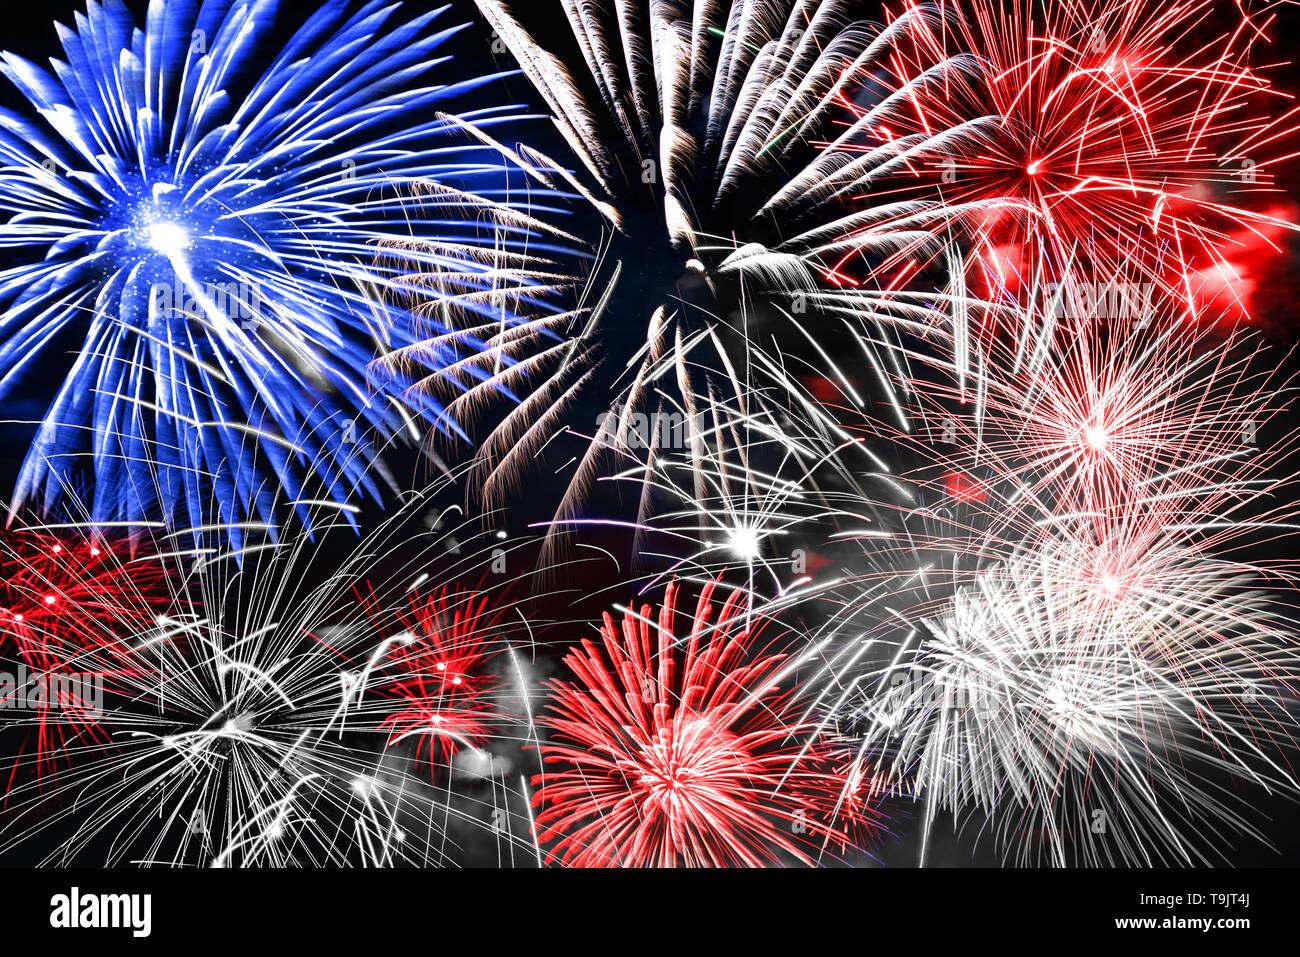 American Flag Fireworks Stock Photos & American Flag ...